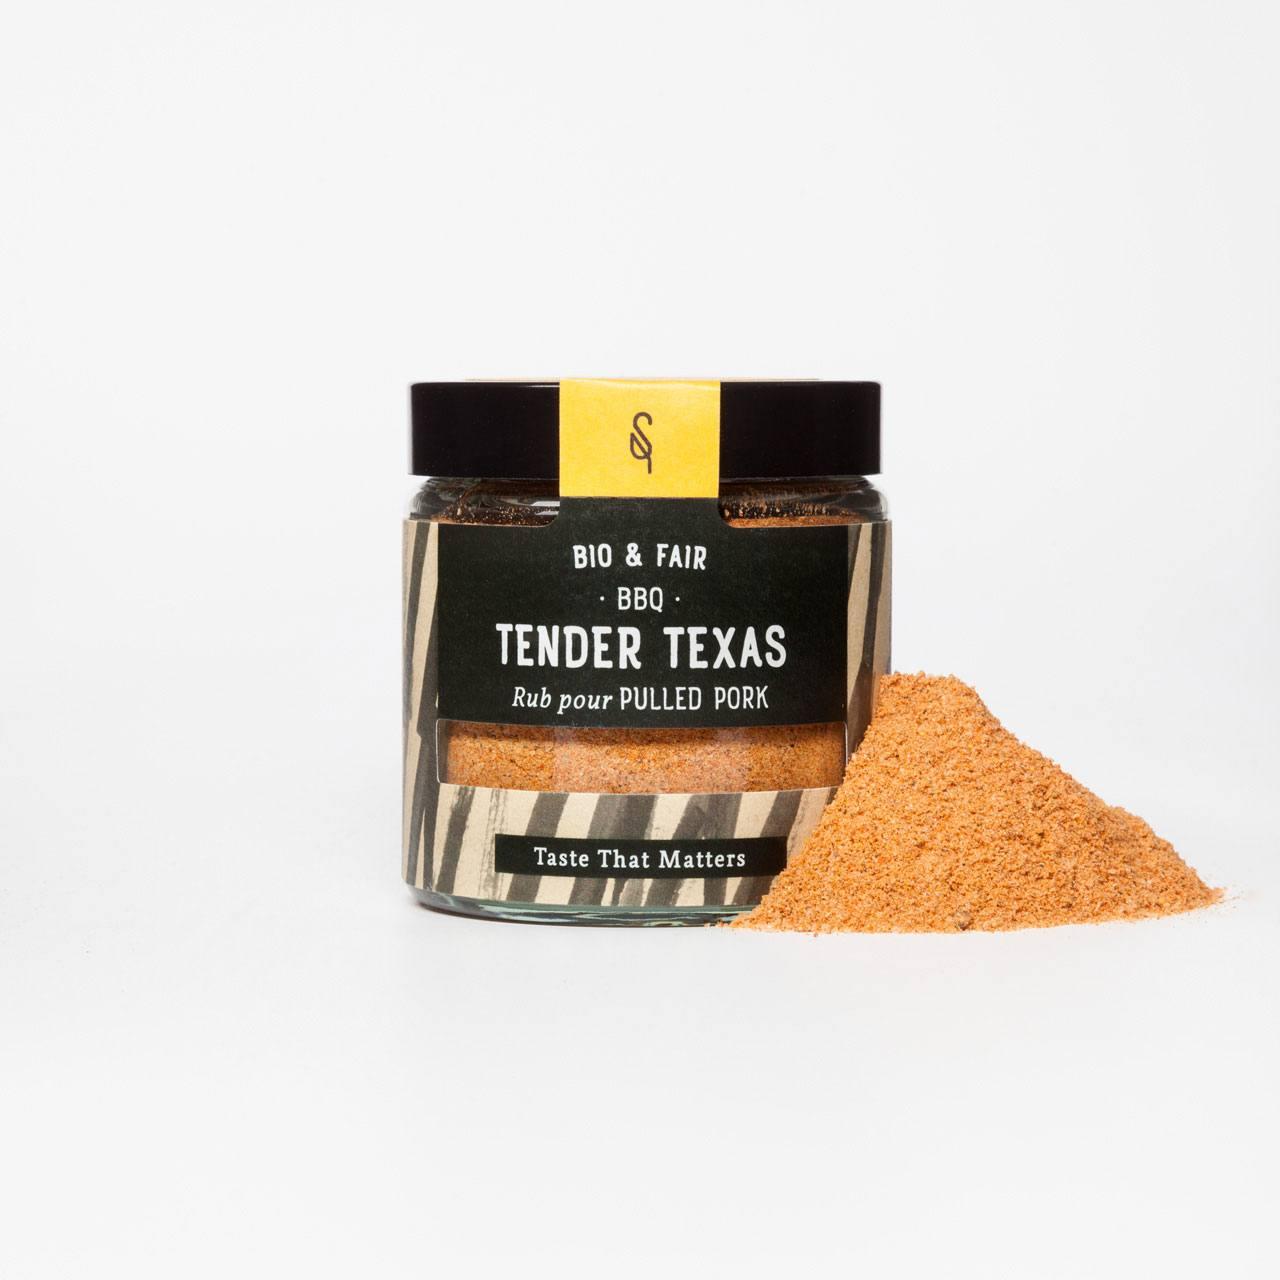 Tender Texas BBQ SoulSpice FR